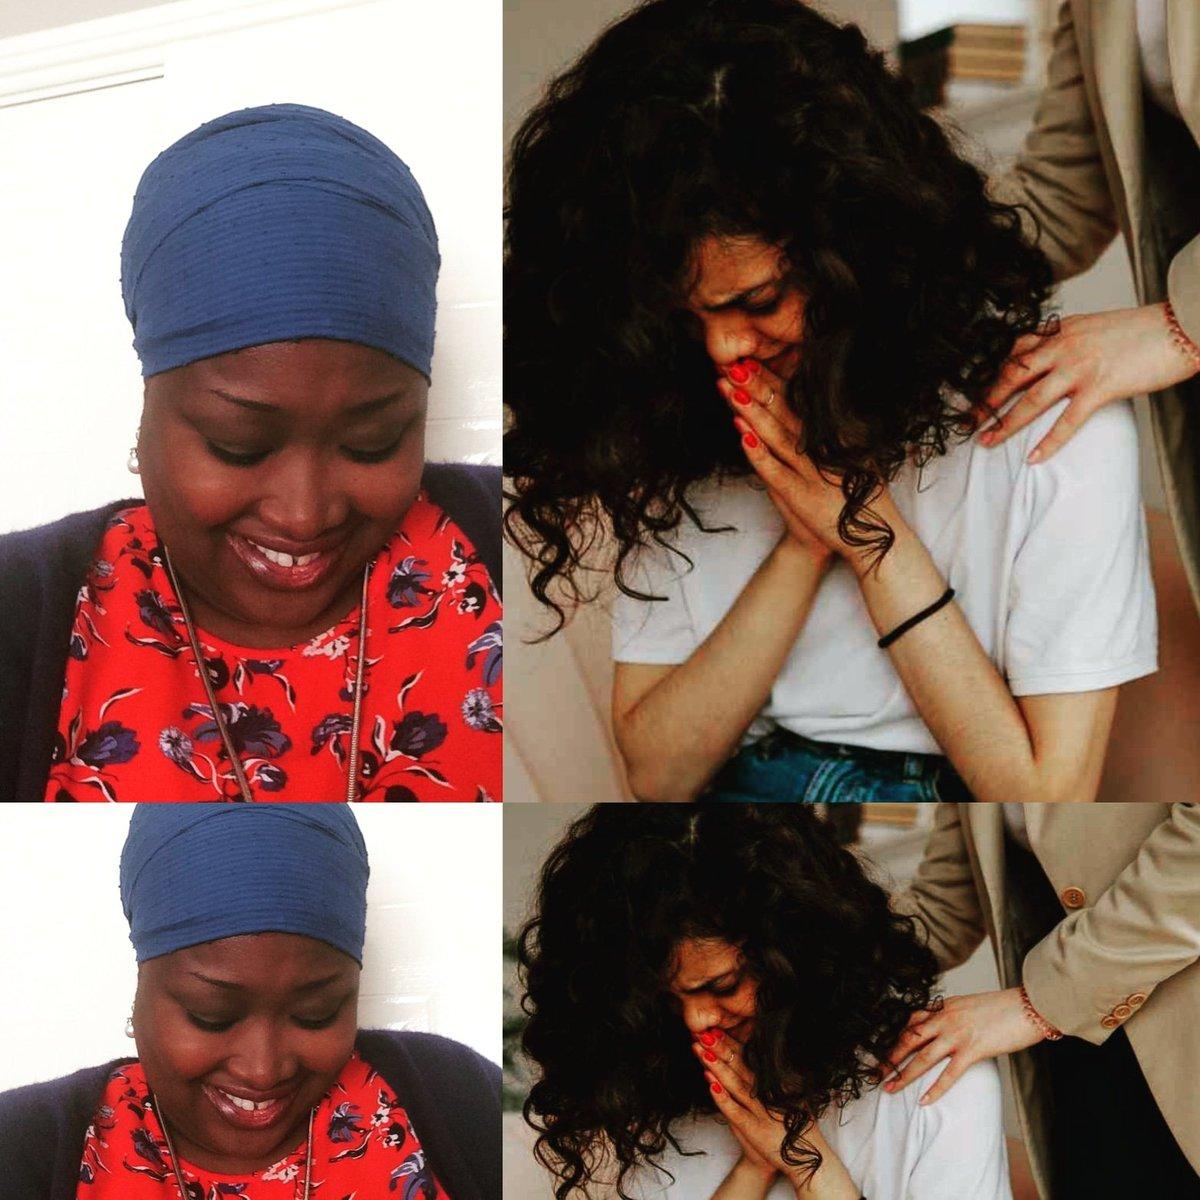 The Power Of A Single Touch On Someone In Distress.  Read on...  https://www.rukasplace.com/2020/05/22/the-power-of-a-single-touch-on-someone-in-distress/…  #mentalhealthawareness #powerofatouch #bekindalways #emotionaltrauma #fibromyalgia #chronicpain #nigerianblogger #nigerians #irishwomen #rukasplace #africaninthediasporapic.twitter.com/QqDIxLdg6R